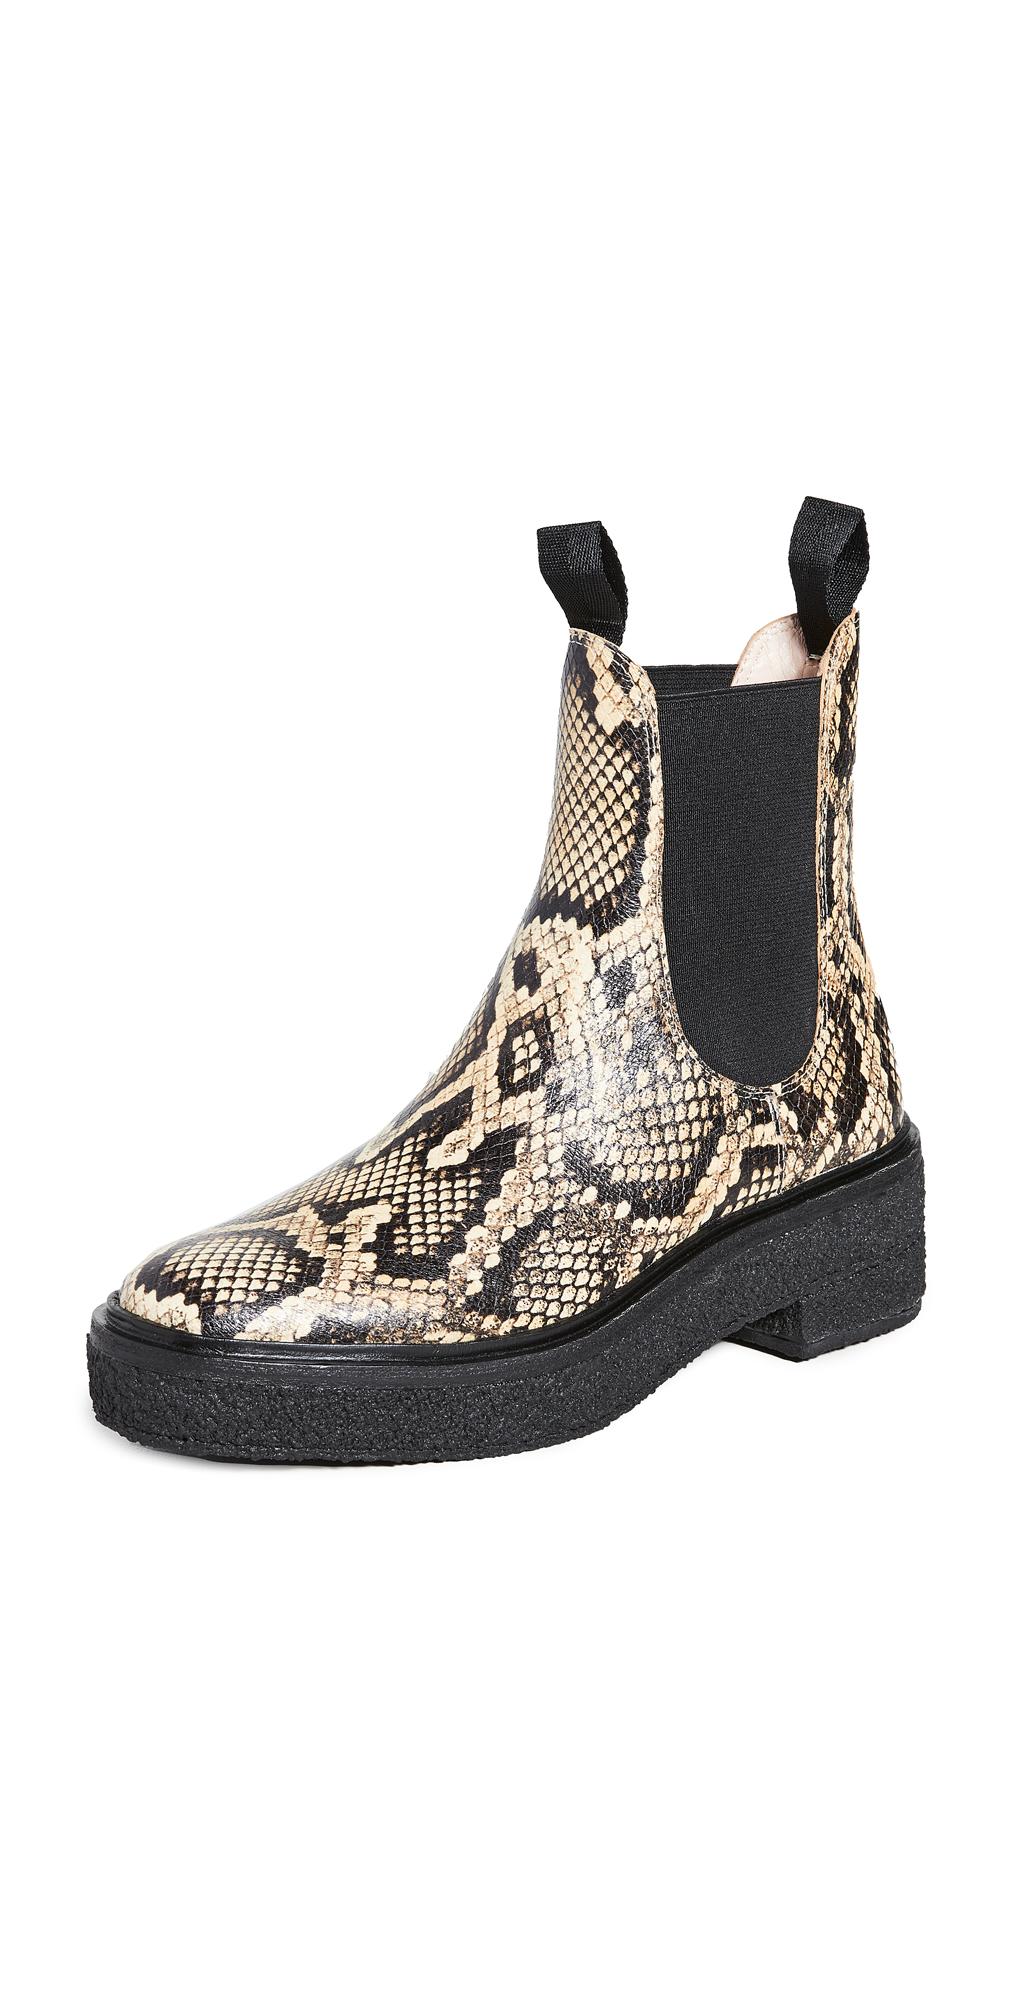 Loeffler Randall Raquel Chelsea Boots